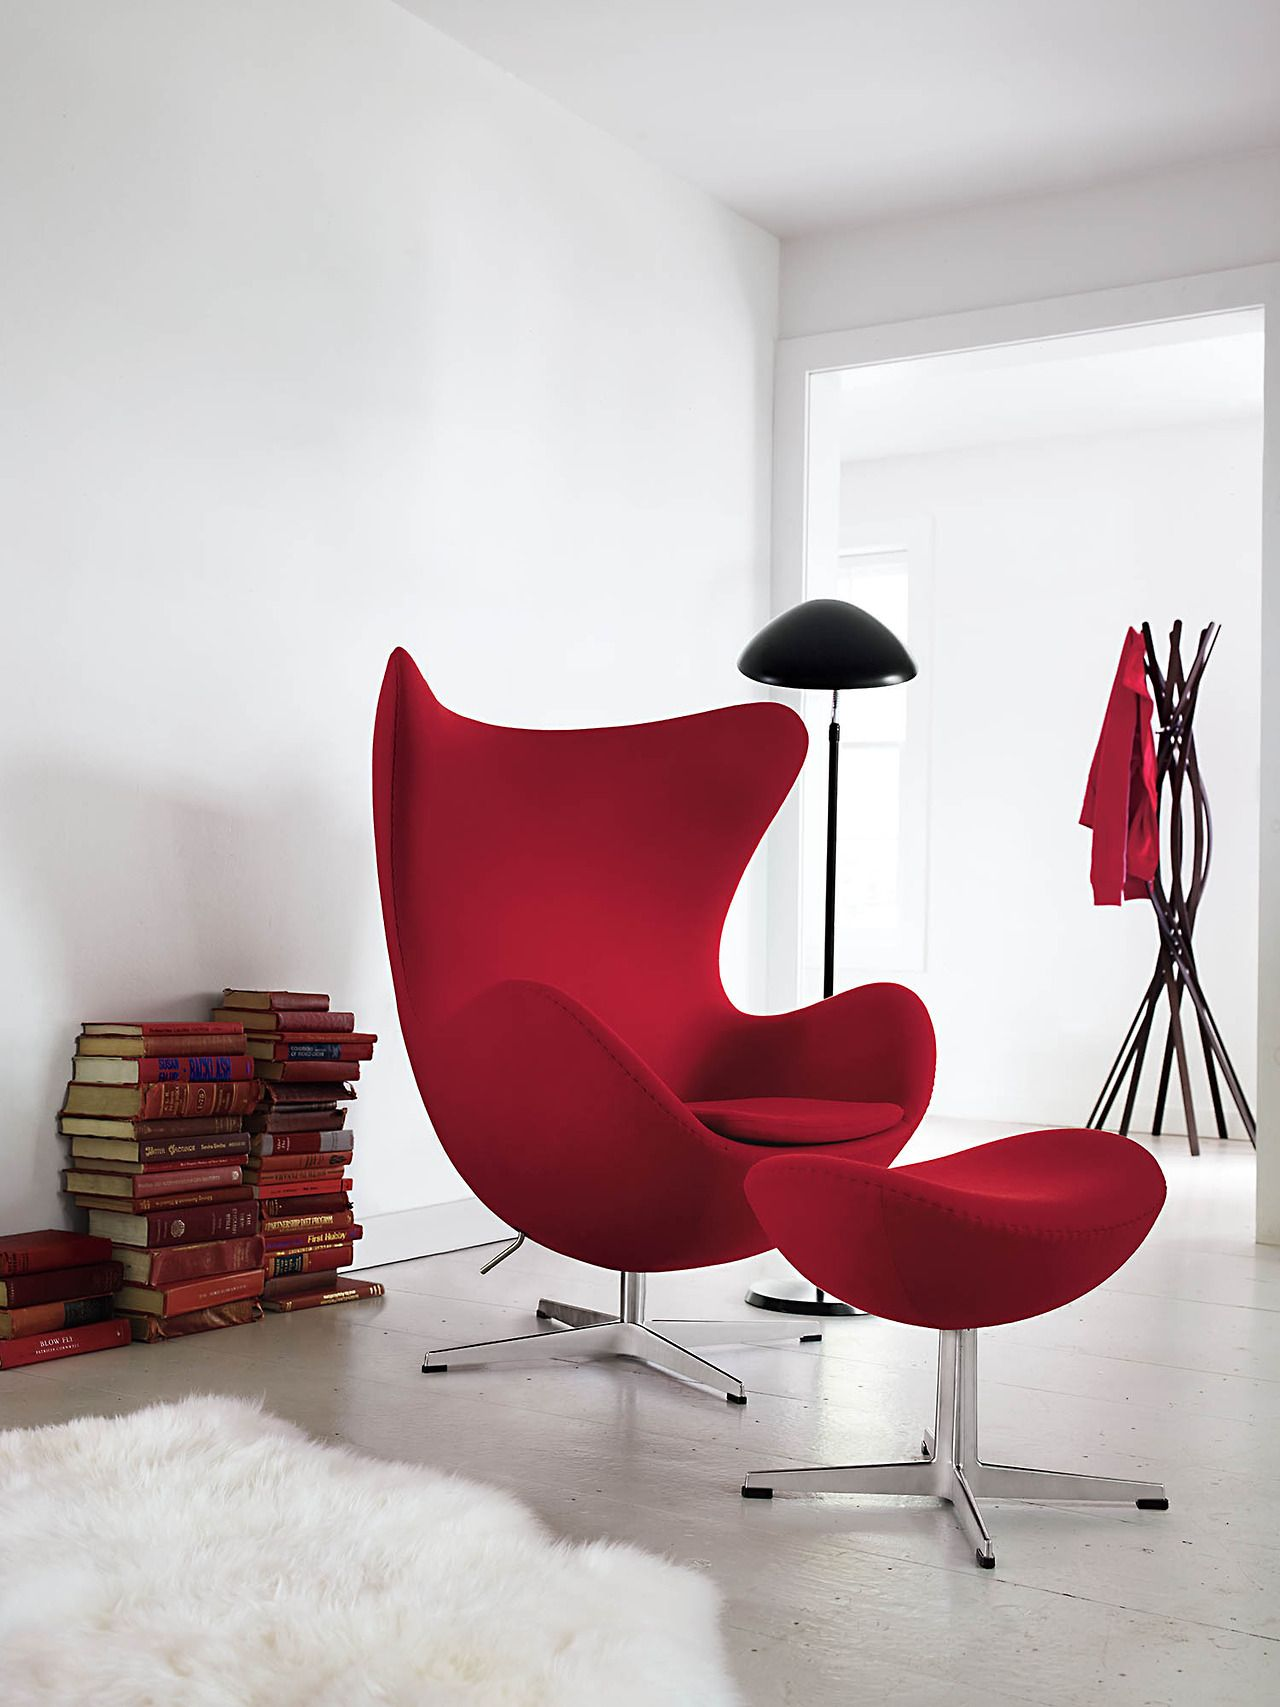 Classics designers arne jacobsen egg chair replica in cowhide - Egg Chair Designed By Arne Jacobsen For Republic Of Fritz Hansen Twist Coat Stand